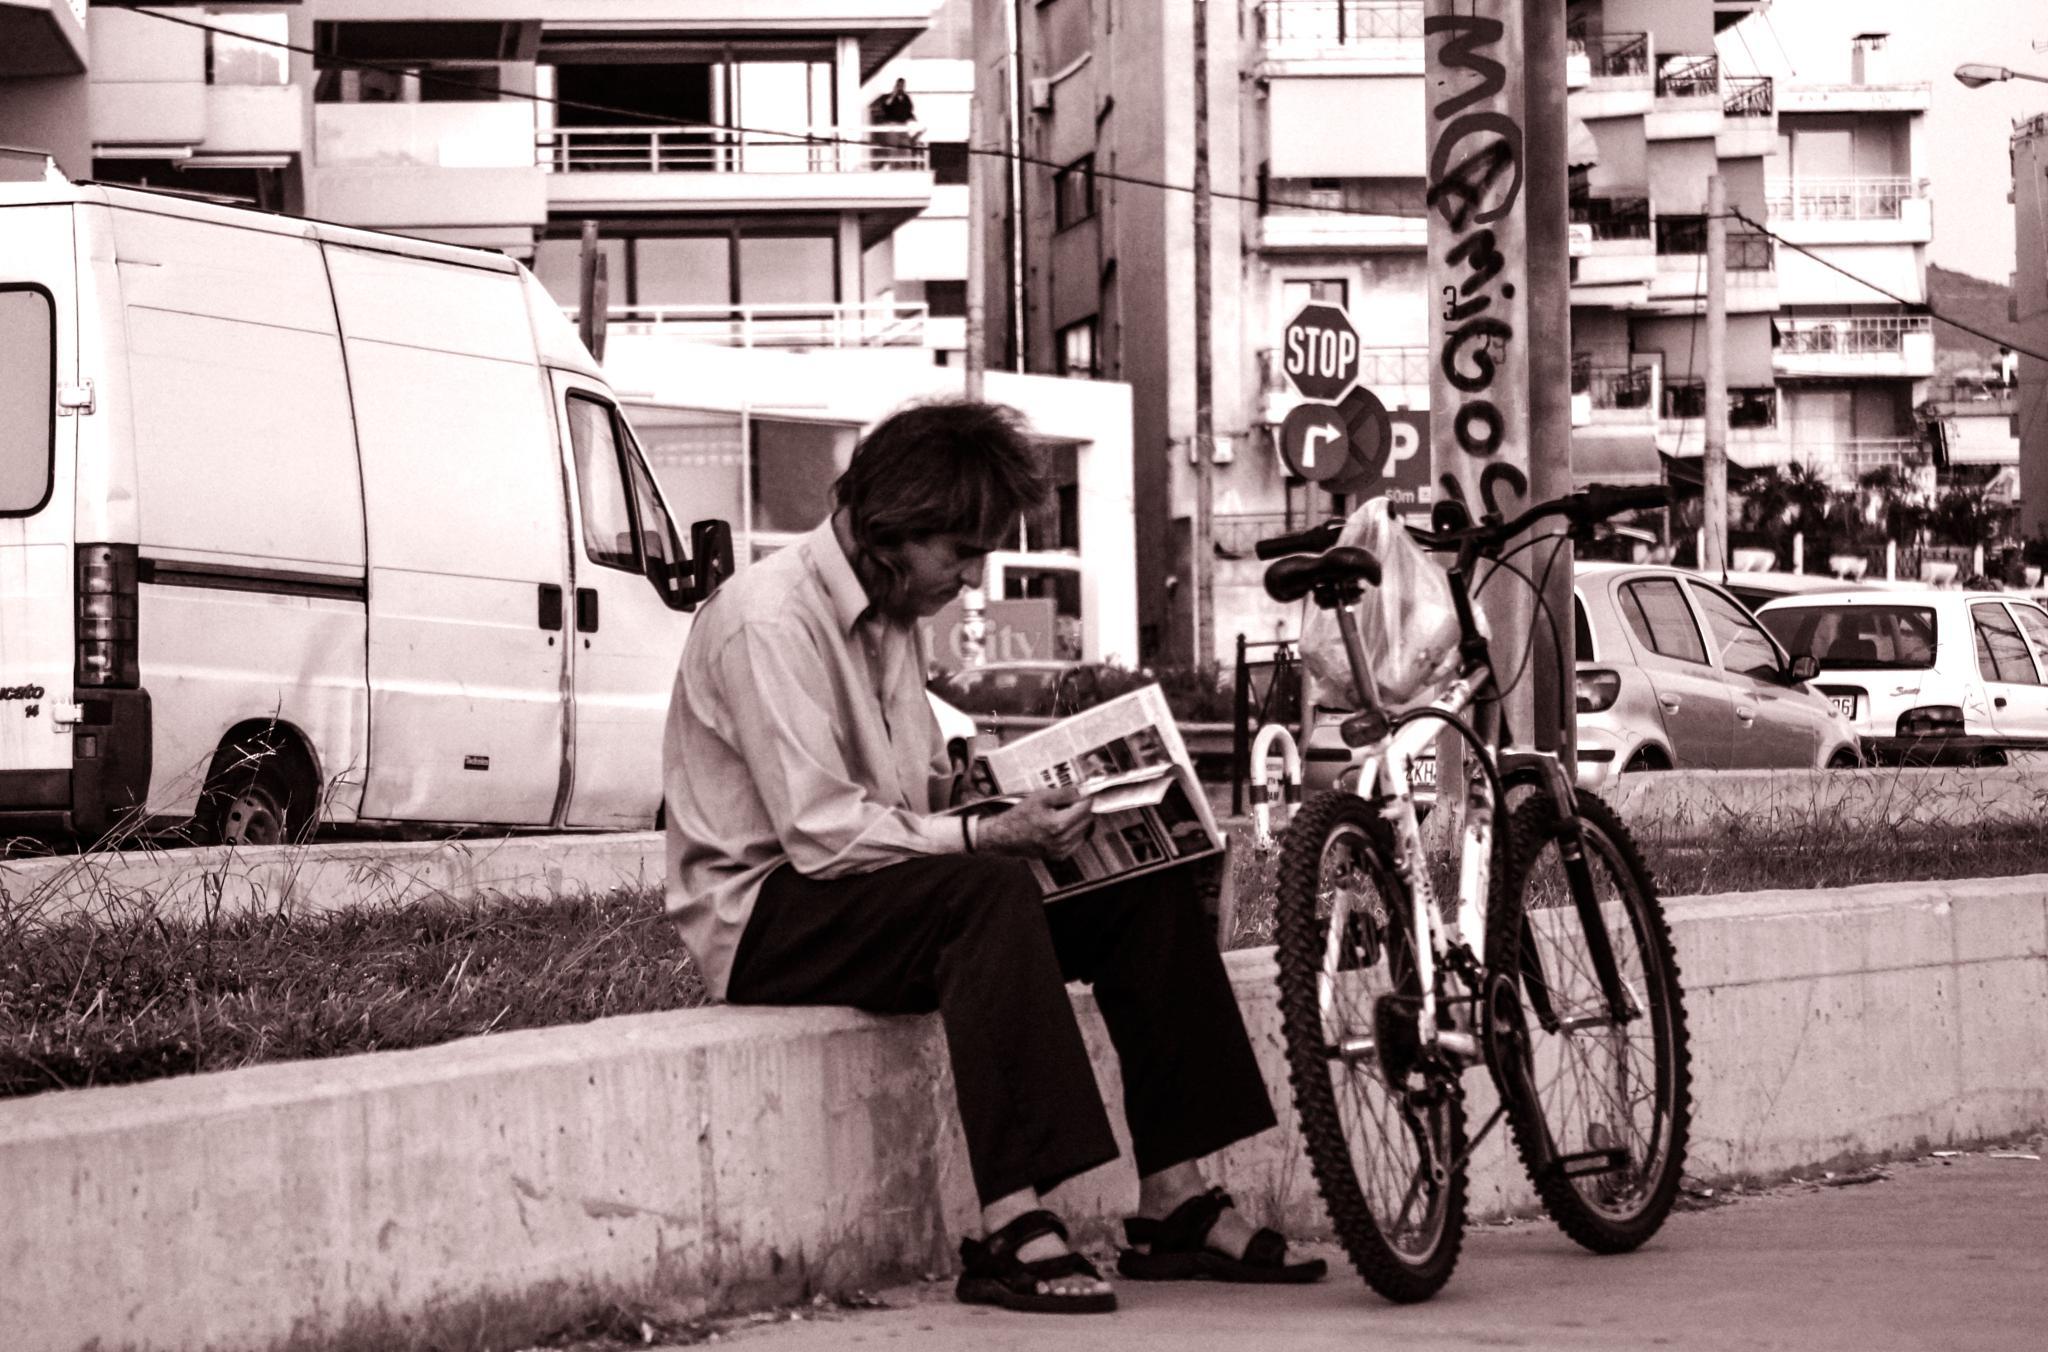 Reading by Ahi Von B